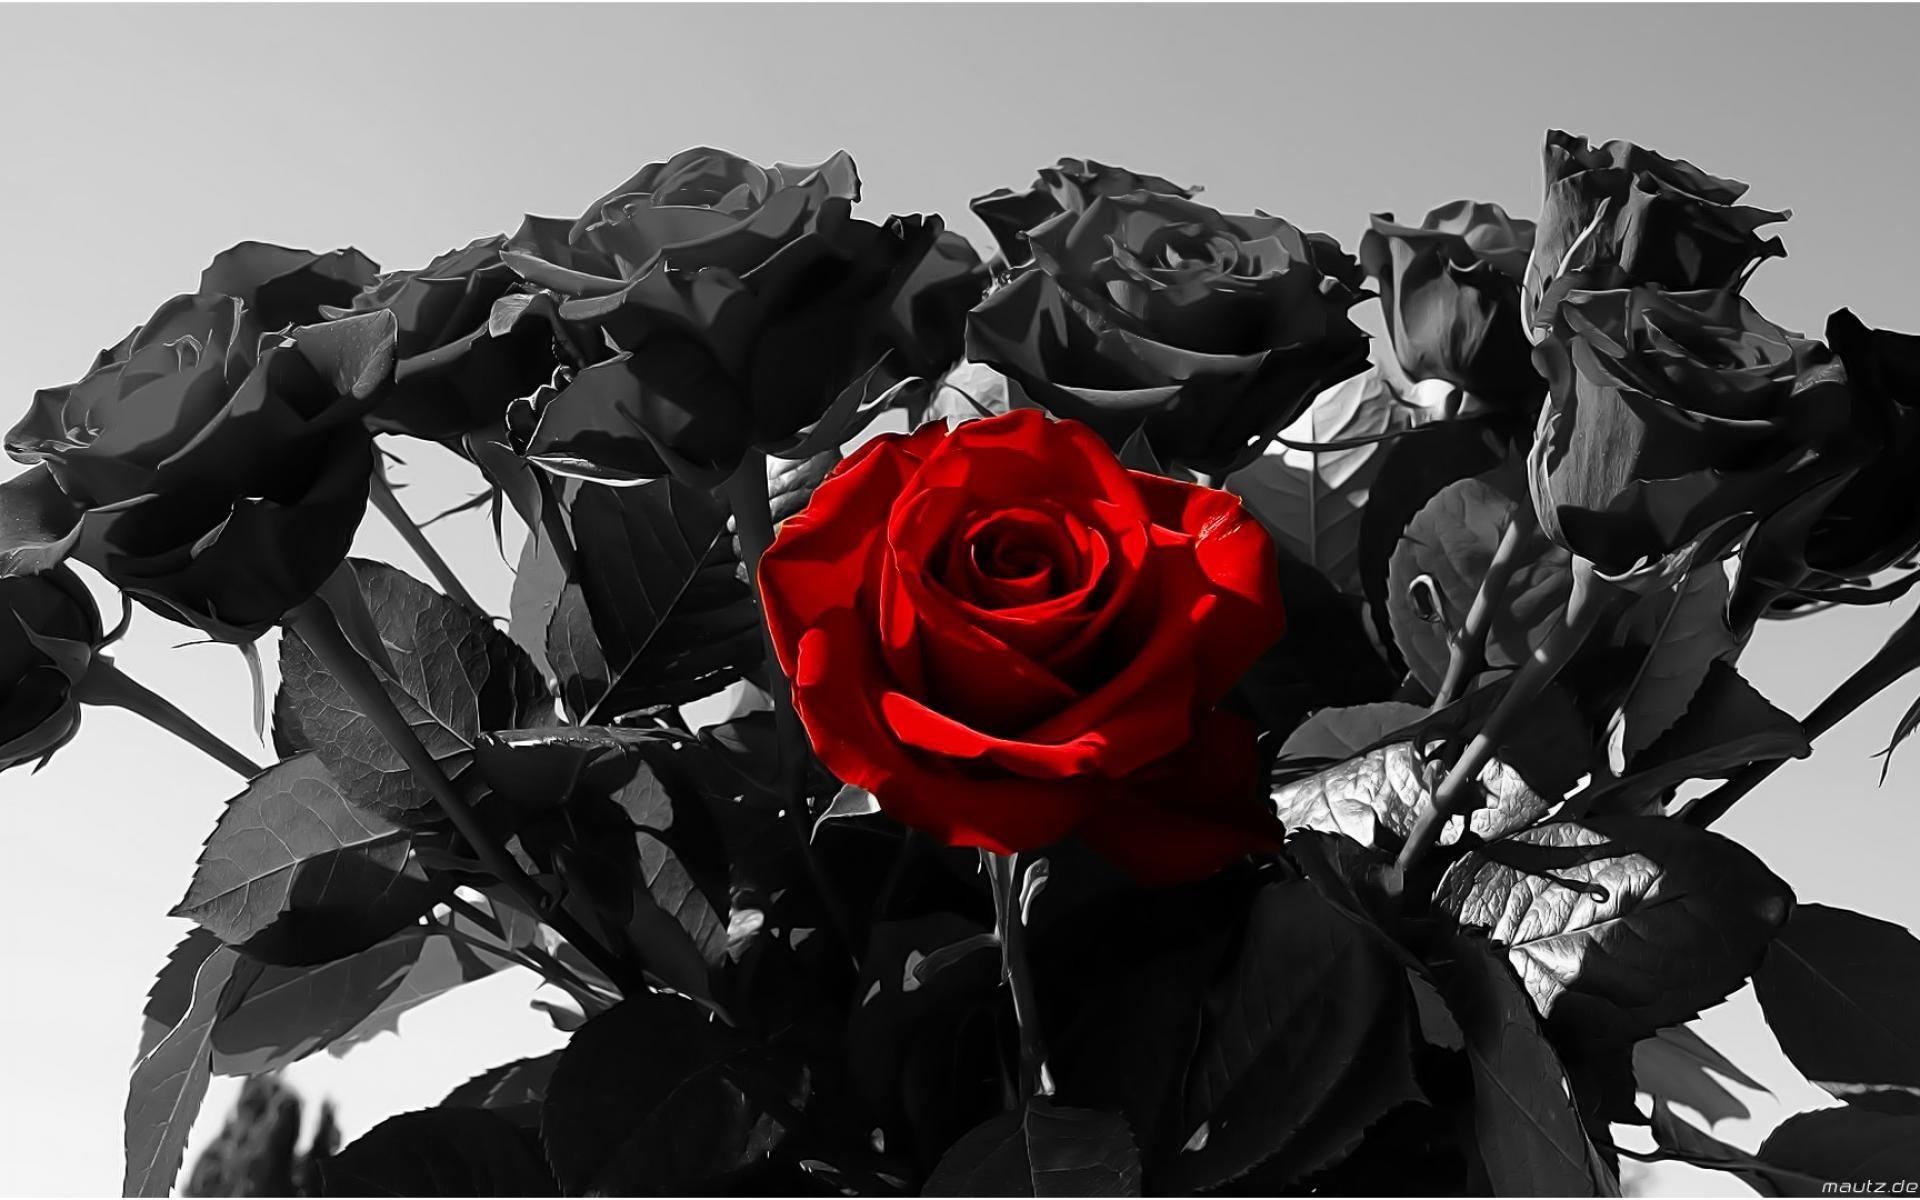 Red rose on black background wallpapertag - Black red rose wallpaper ...